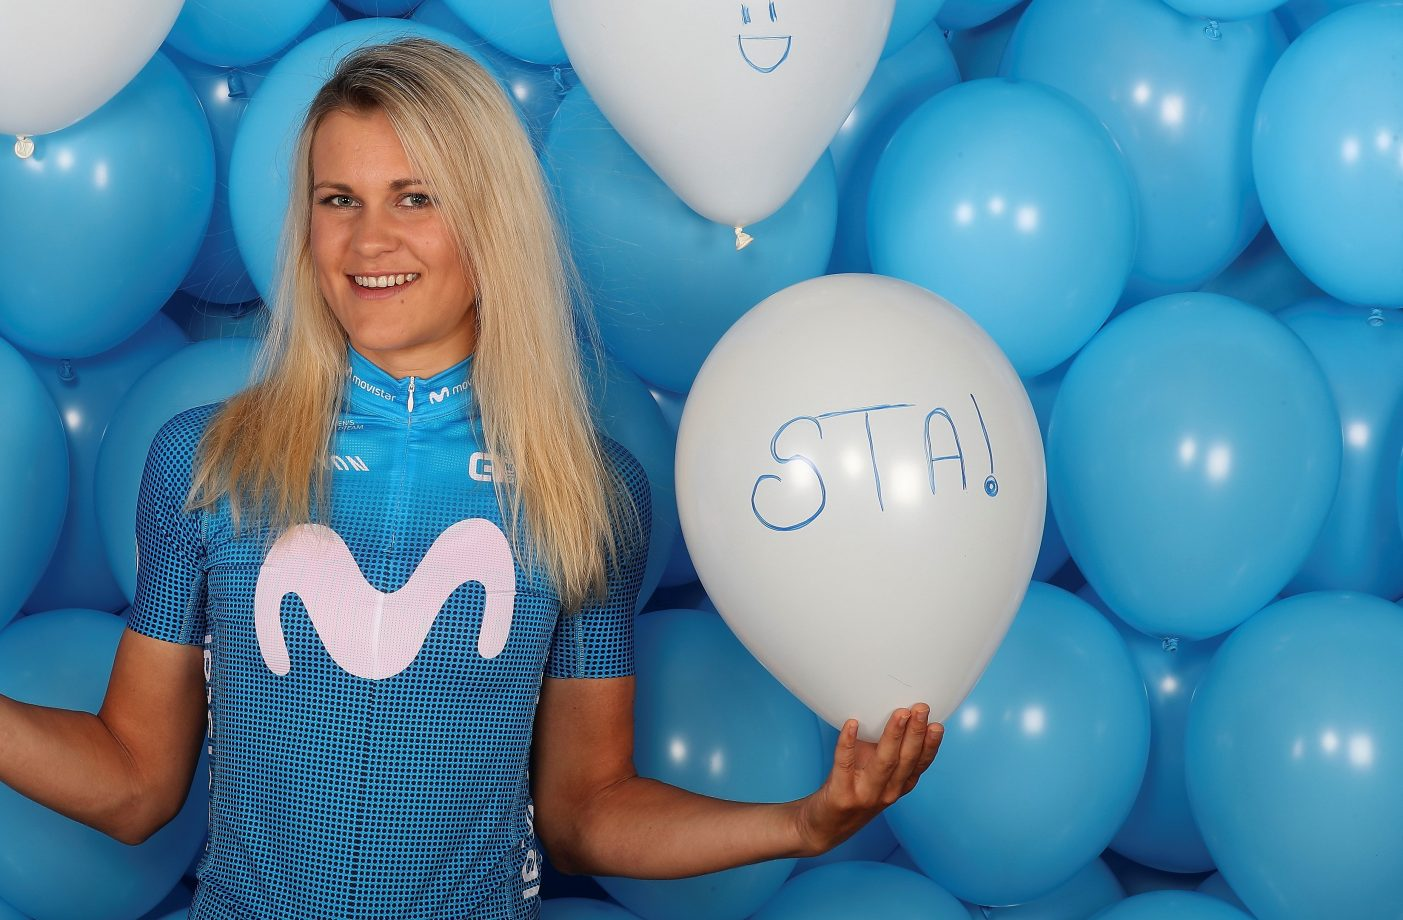 Imagen de la noticia 'Katrine Aalerud: one of Movistar Team's biggest climbing prospects'